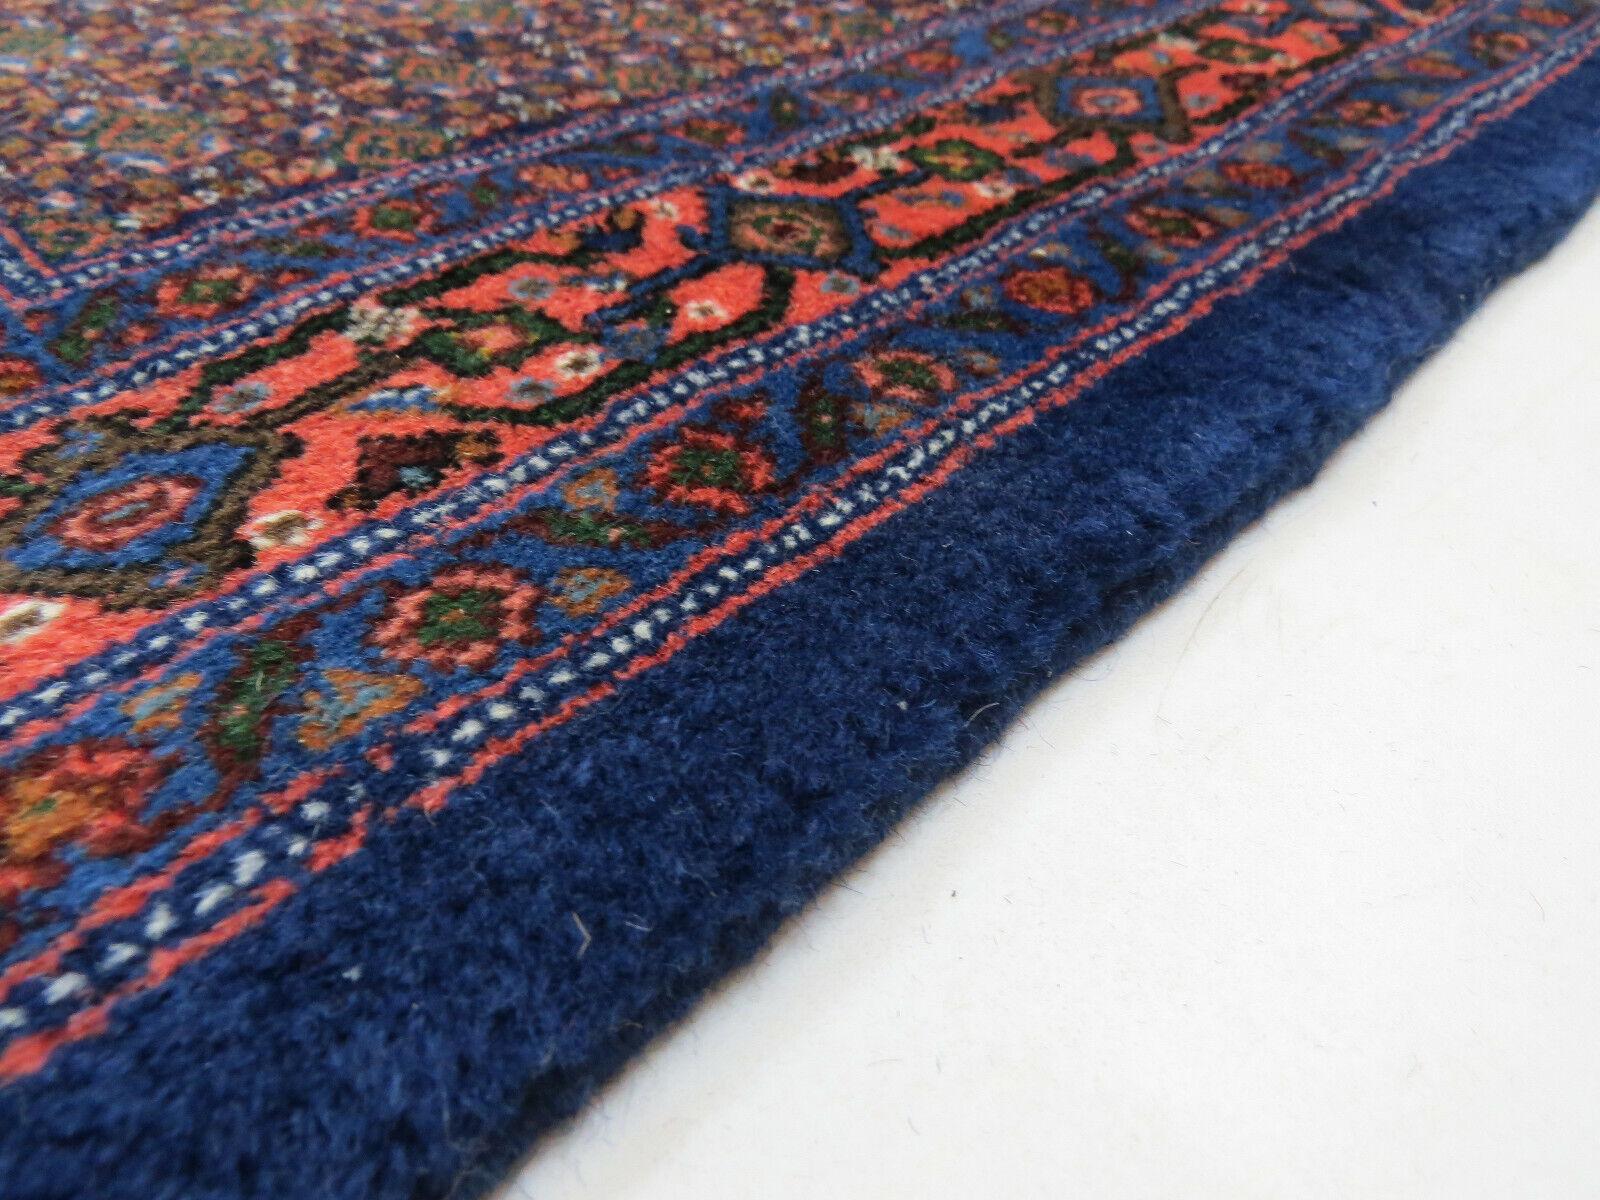 Handgeknüpfter Edler Orientteppich Orientteppich Orientteppich 158x120 Perserteppich NEUWERTIG Senneh Re 61aaf3